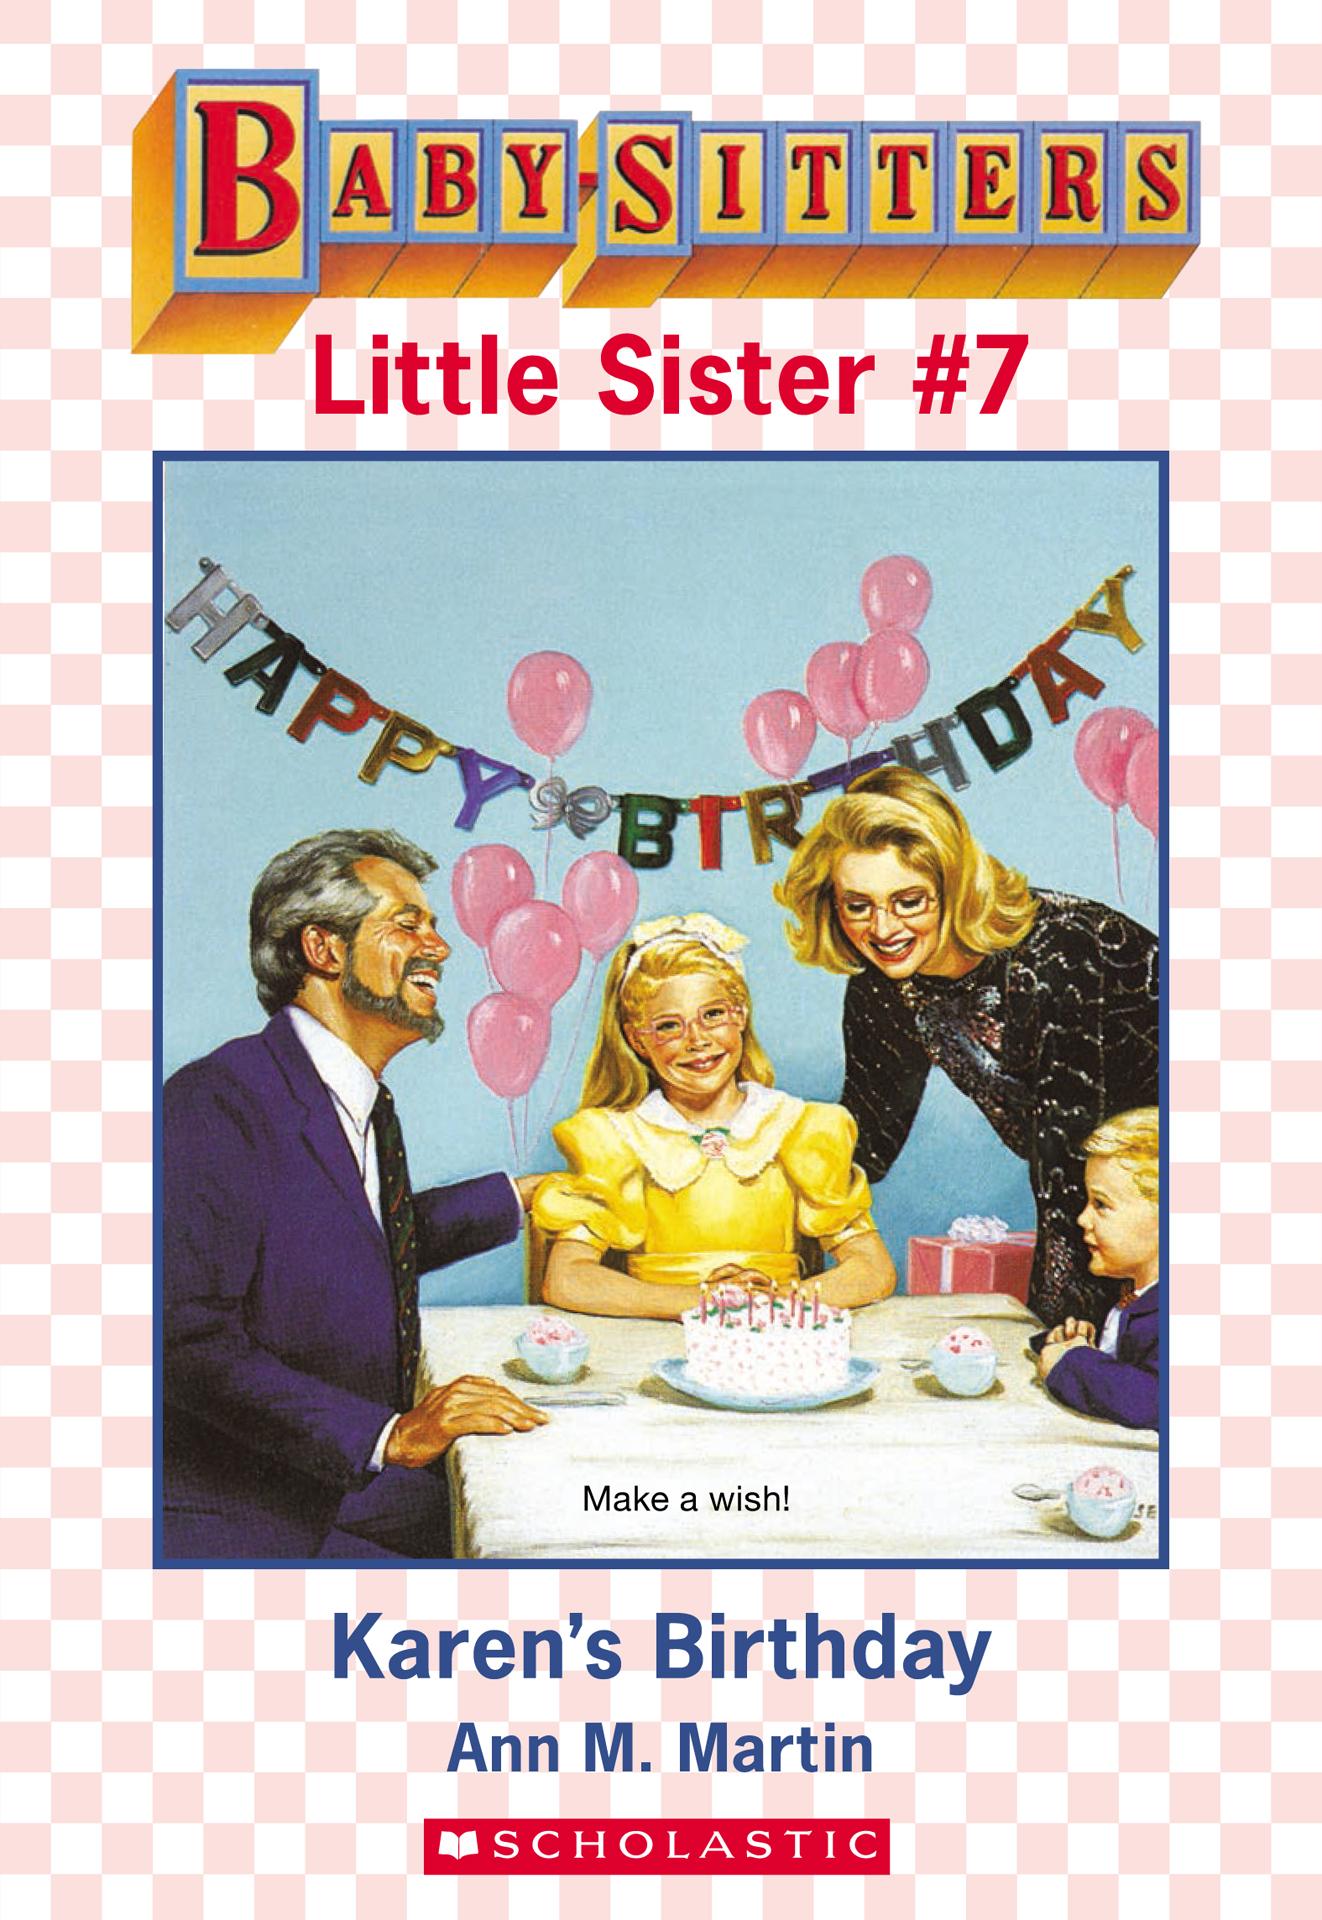 karens birthday the babysitters club wiki fandom